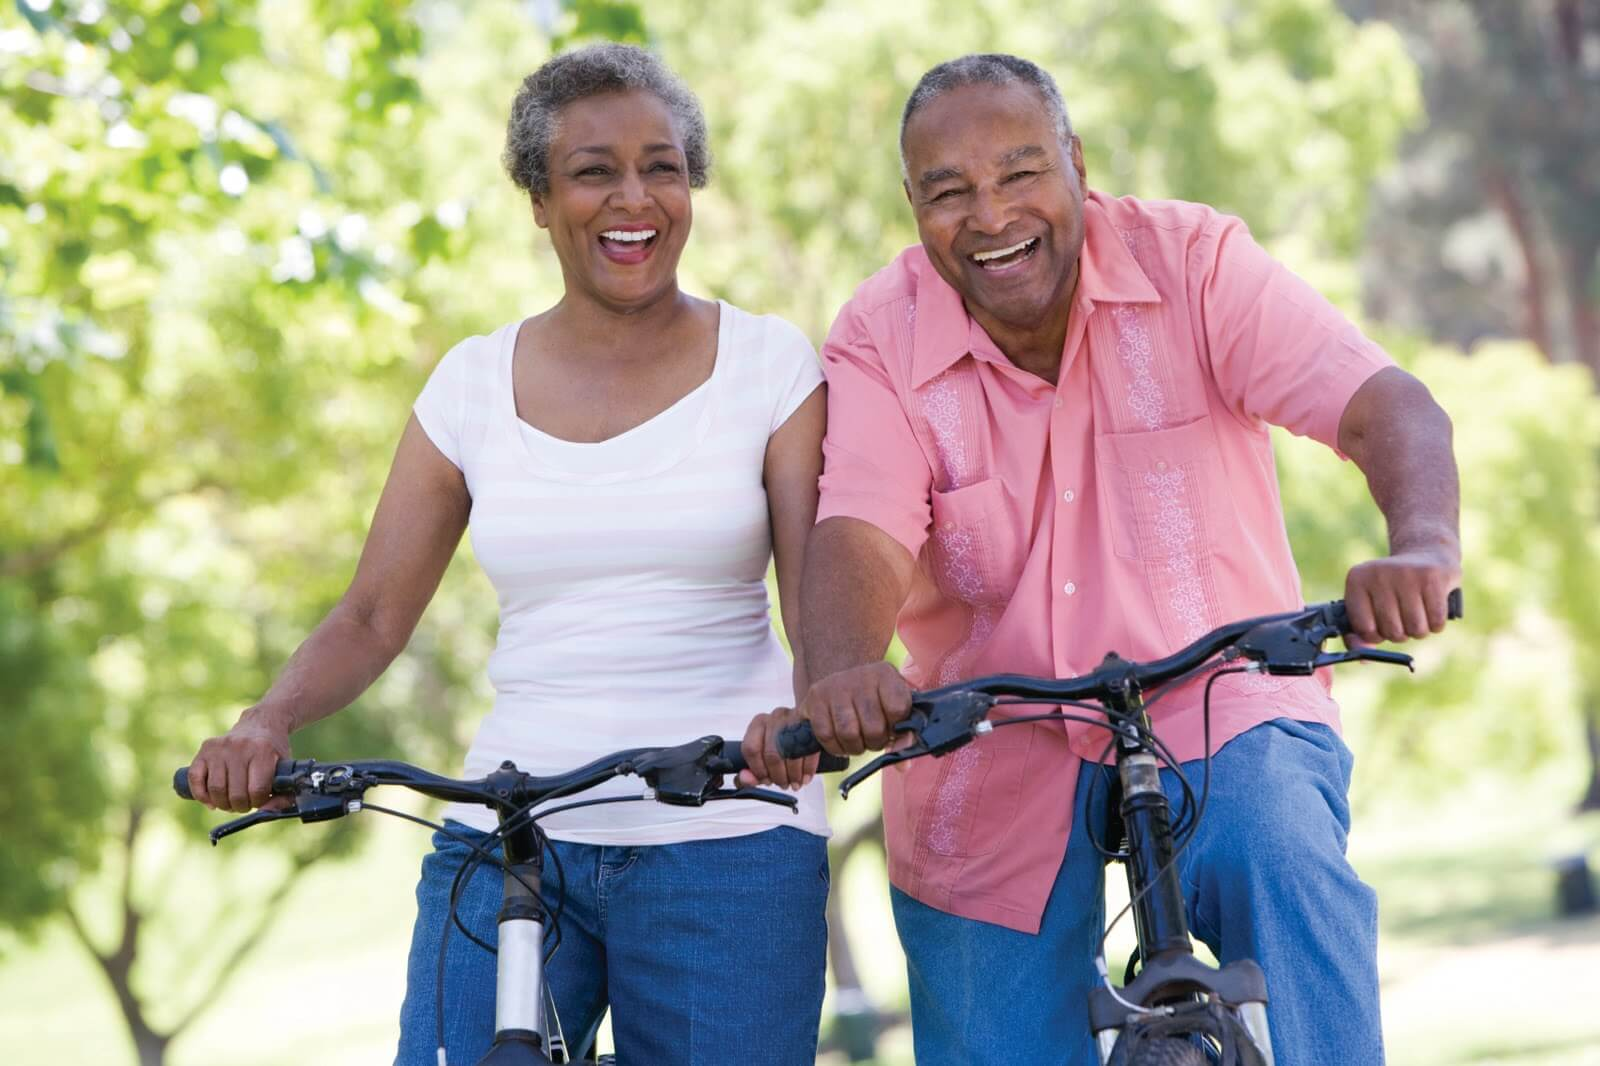 senior black couple on bicycles